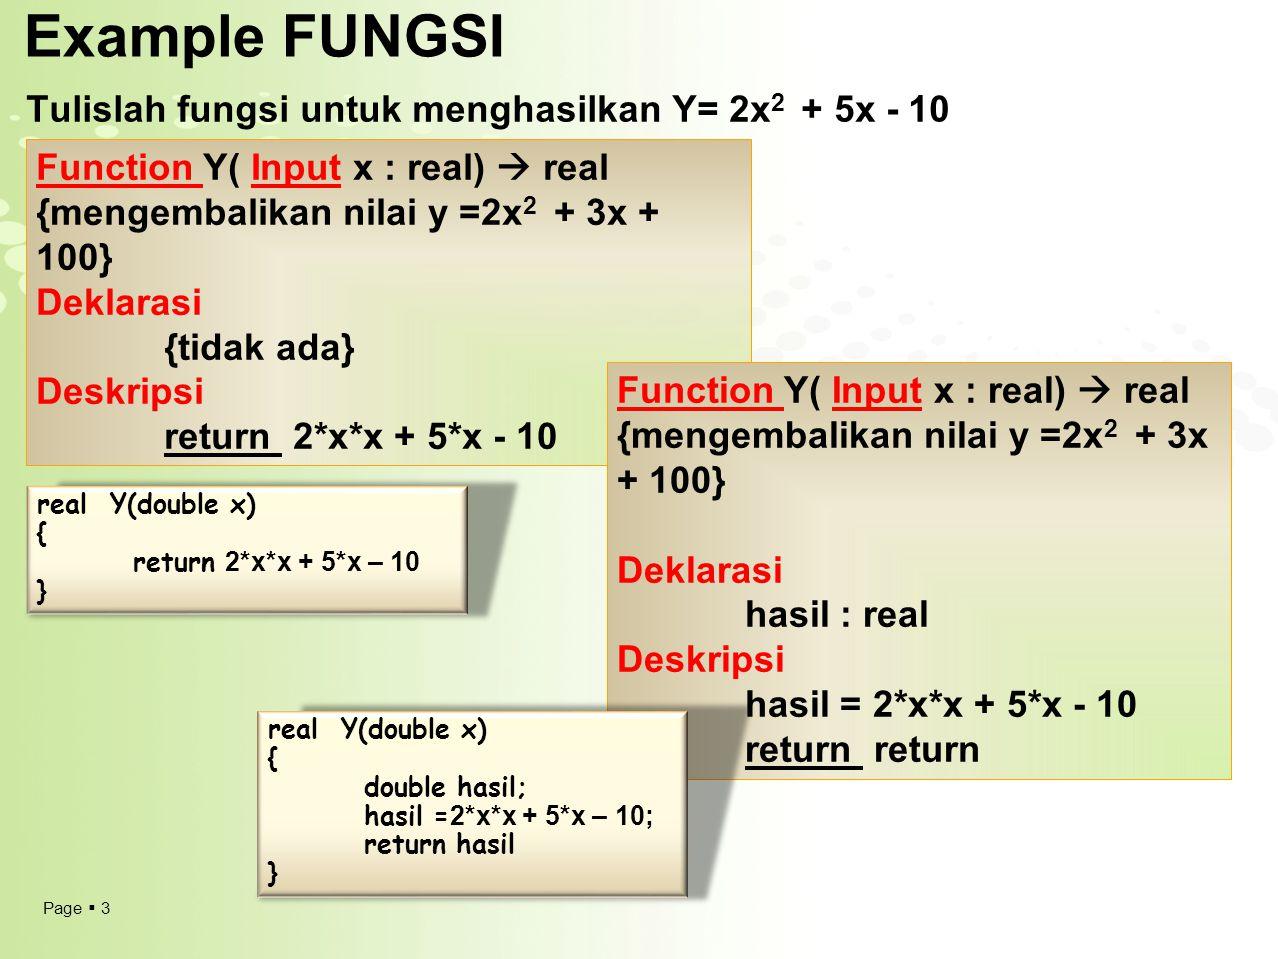 Page  14 TIPE DATA BOOLEAN Algoritma DemoBoolean2 {Demo penggunaan Boolean} Deklarasi ulang : boolean input : string Deskripsi input  Y ulang  TRUE while ulang do write('BREEZE') read(input) if input='Y' then ulang  TRUE else ulang  FALSE endif endWhile #include using namespace std; void main() {bool ulang; string ulang; ulang=true; input= y ; while (ulang) { cout<< BREEZE...